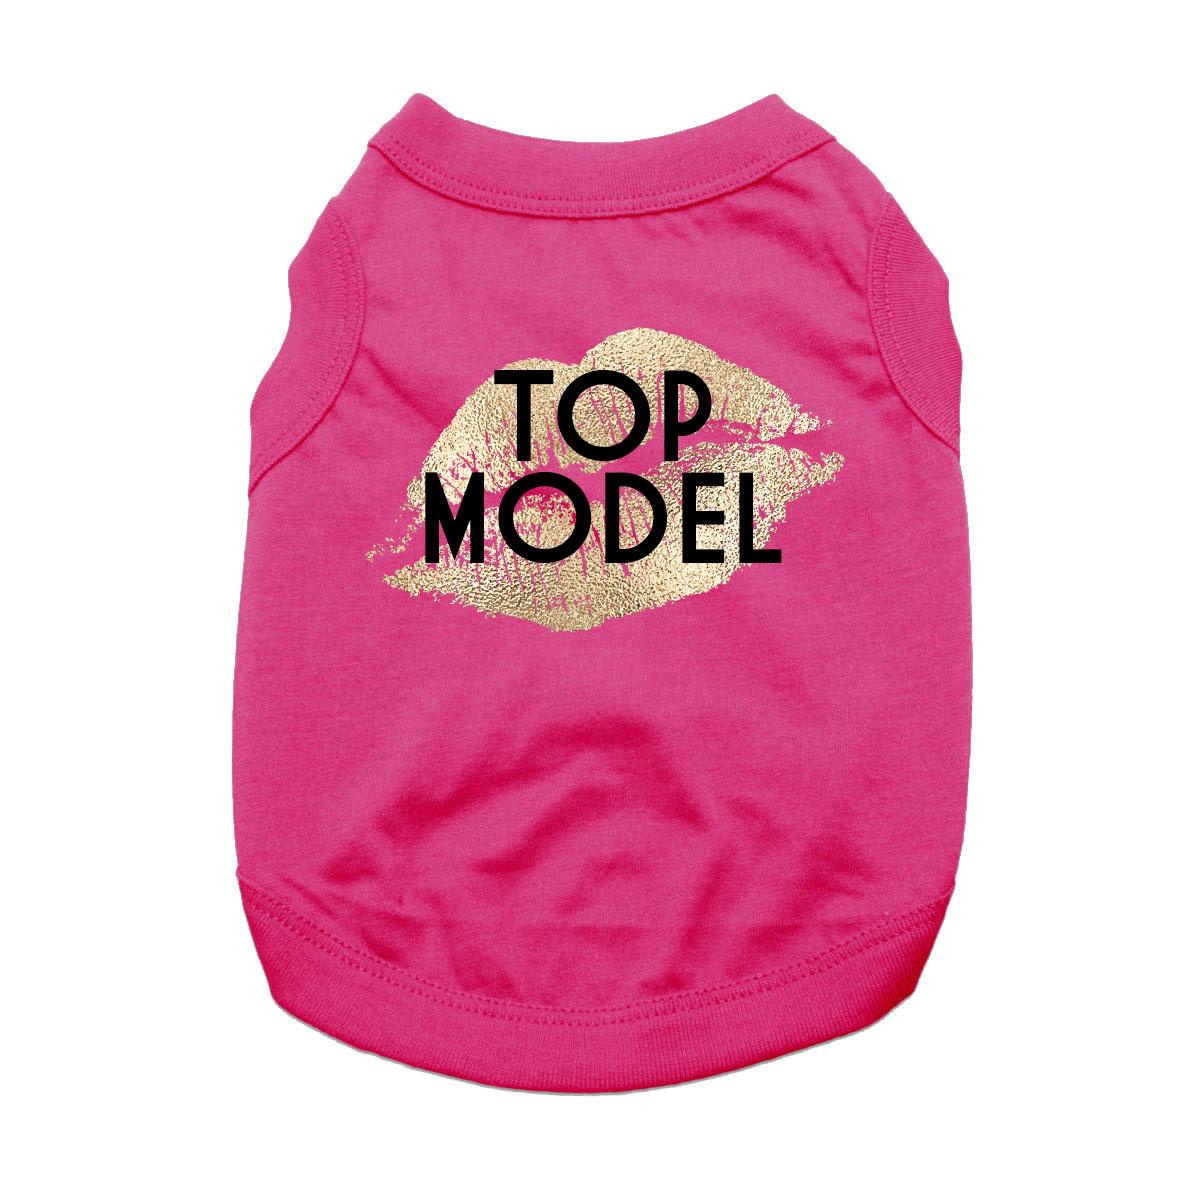 Top Model Dog Shirt - Raspberry